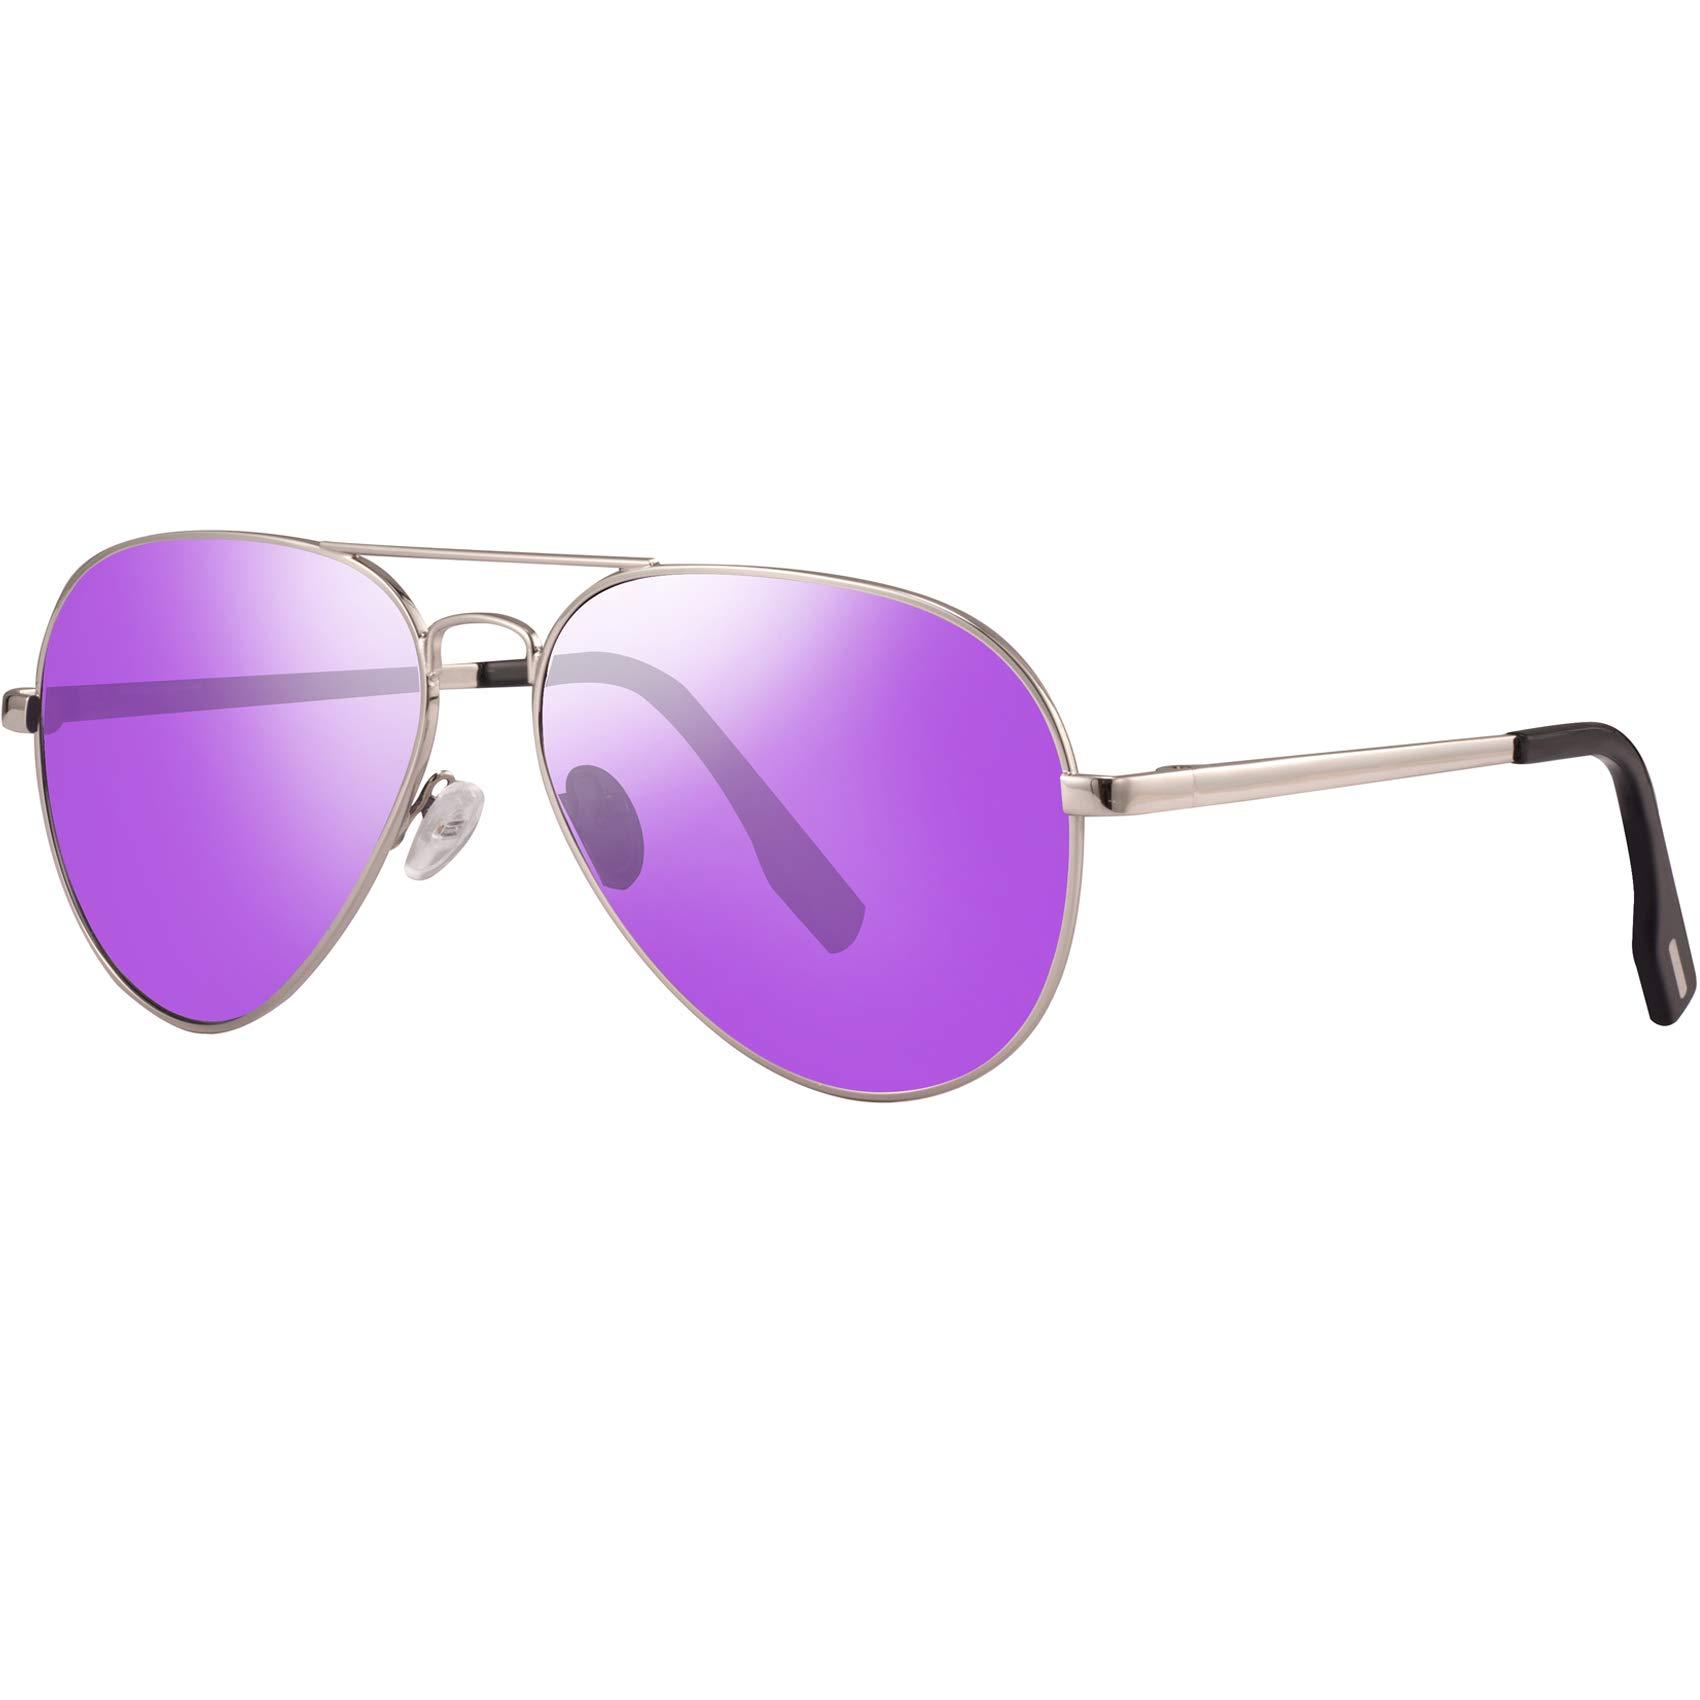 Polarized Sunglasses Aviator Sunglasses for Men - FEIDU Polarized Aviator Sunglasses for Men Sunglasses Man FD9007 (purple) by FEIDU